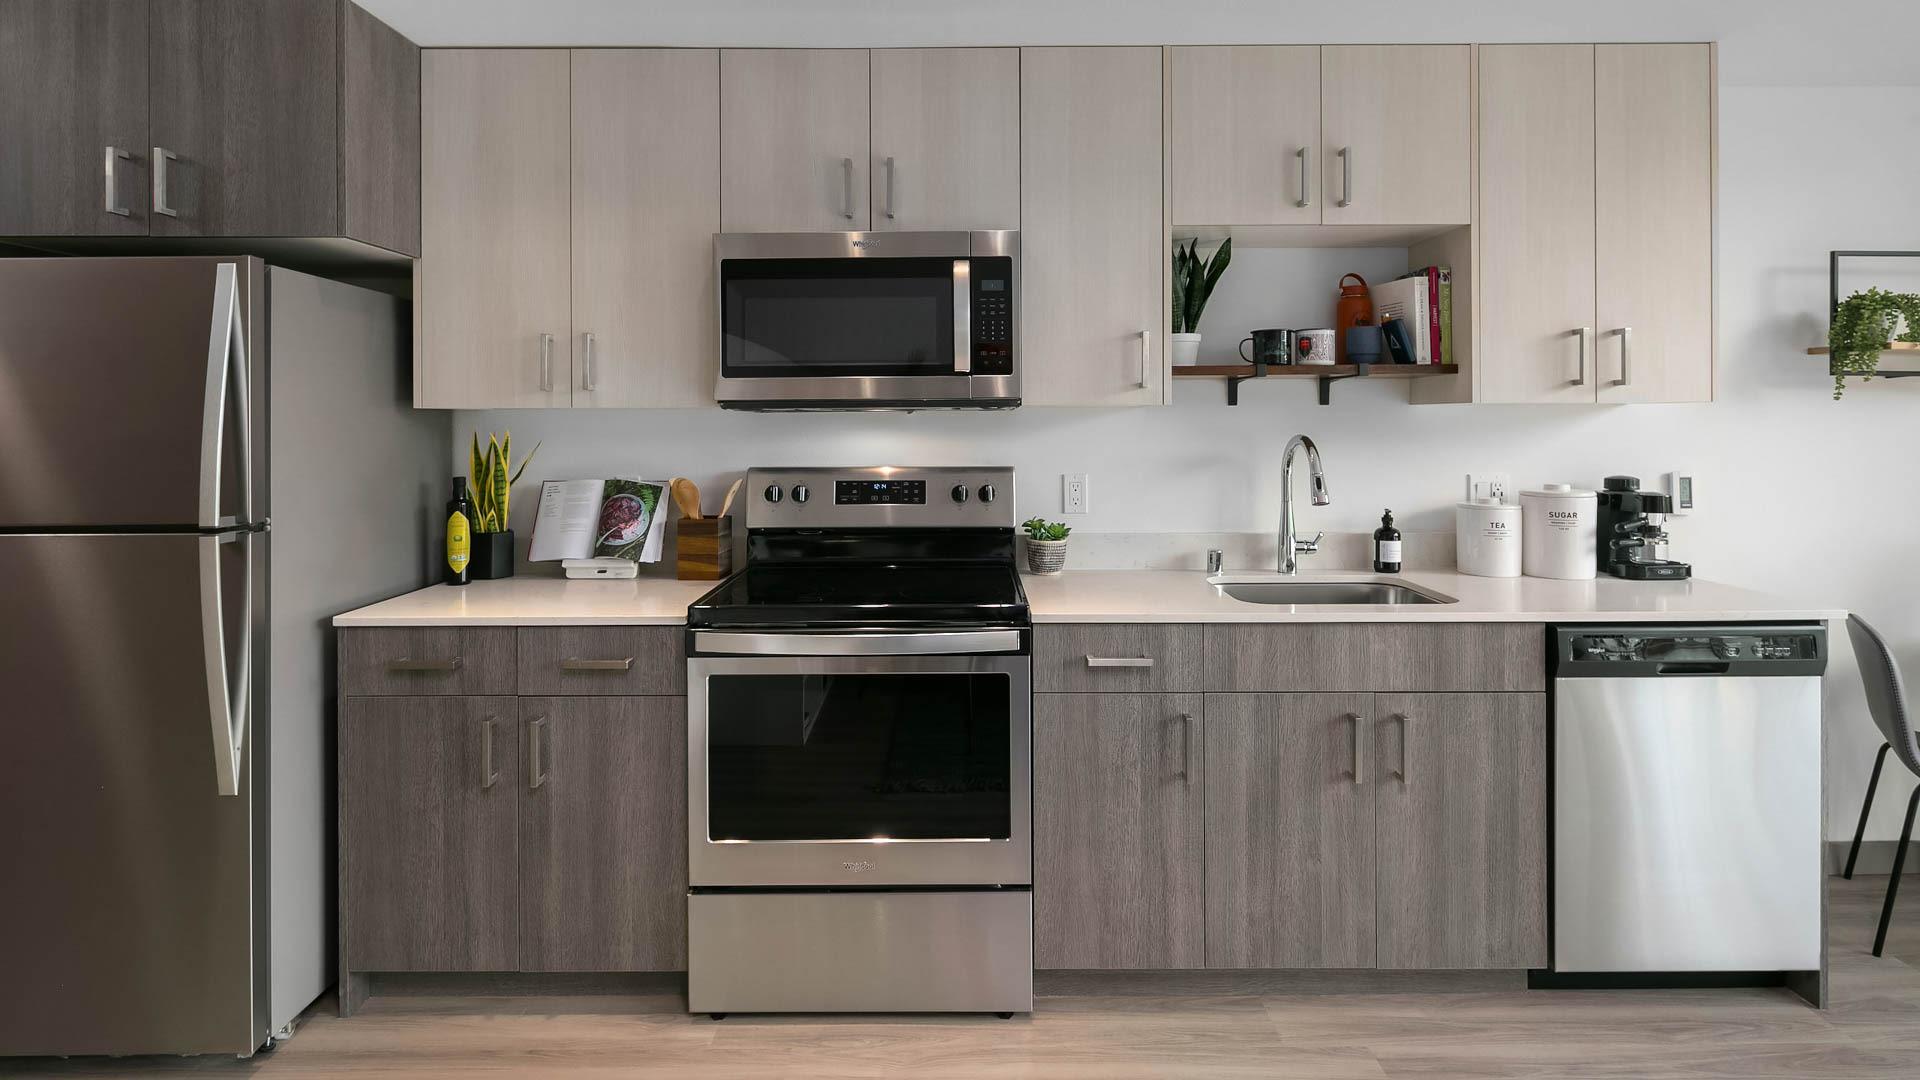 Notch Apartments - Kitchen